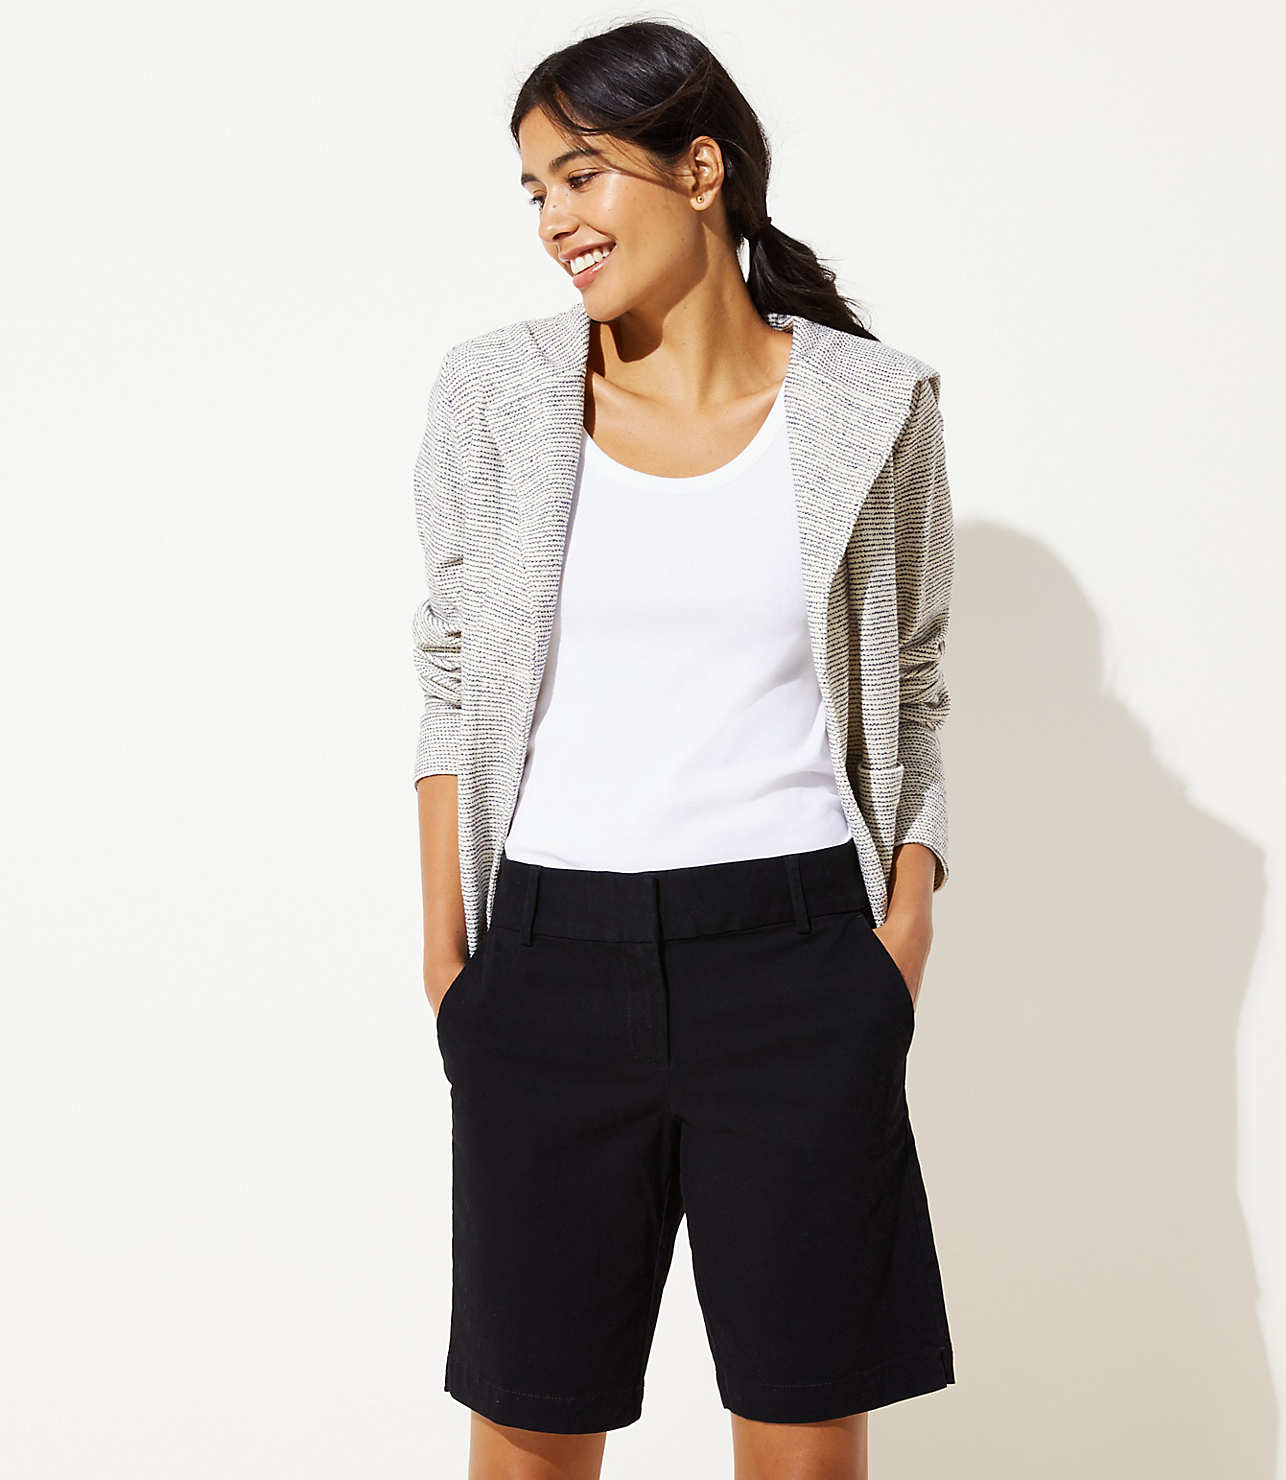 Riviera Shorts with 10 Inch Inseam | LOFT